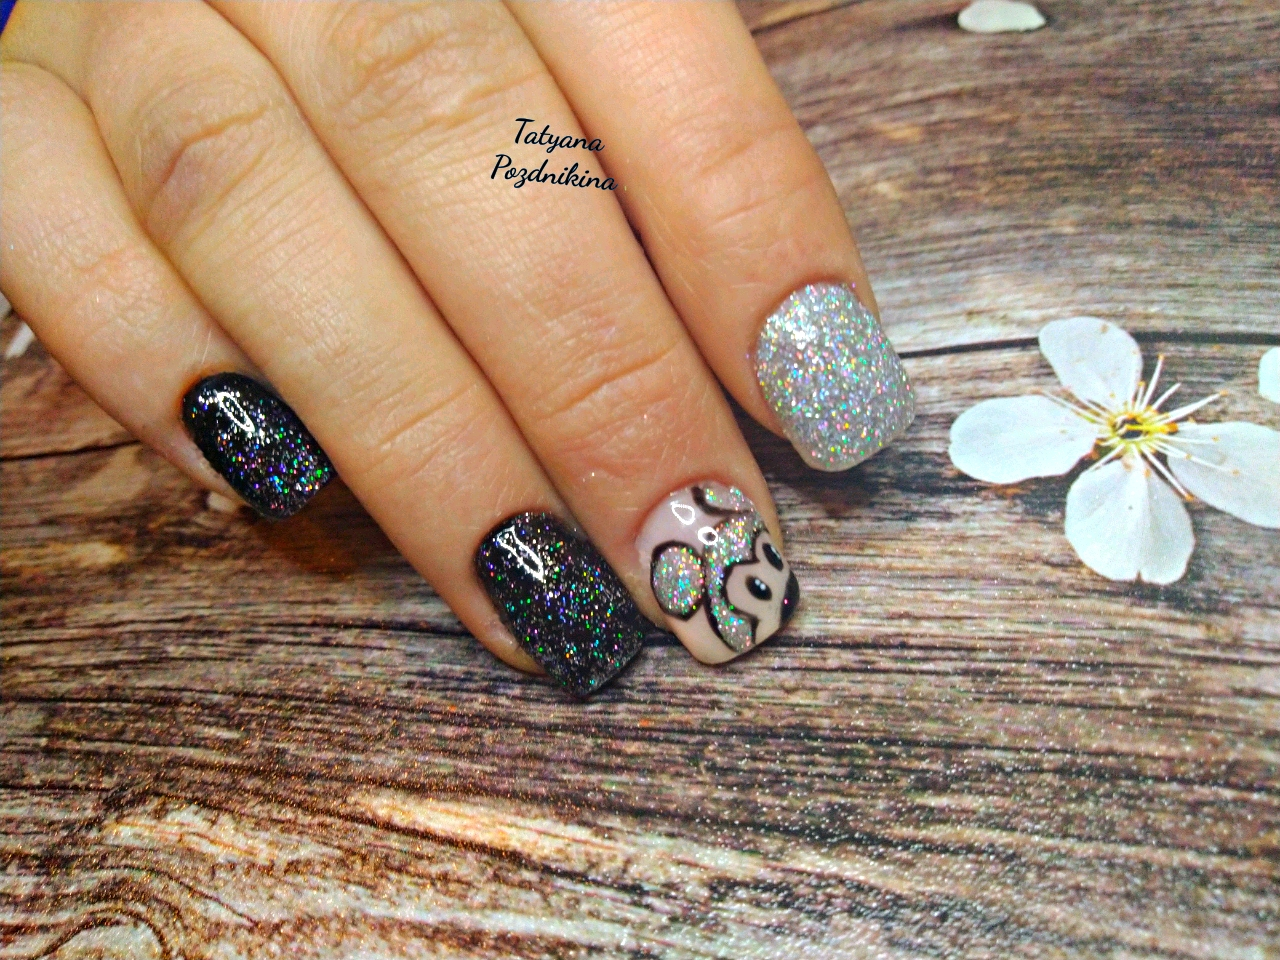 Маникюр с Микки Маусом и блестками на короткие ногти.